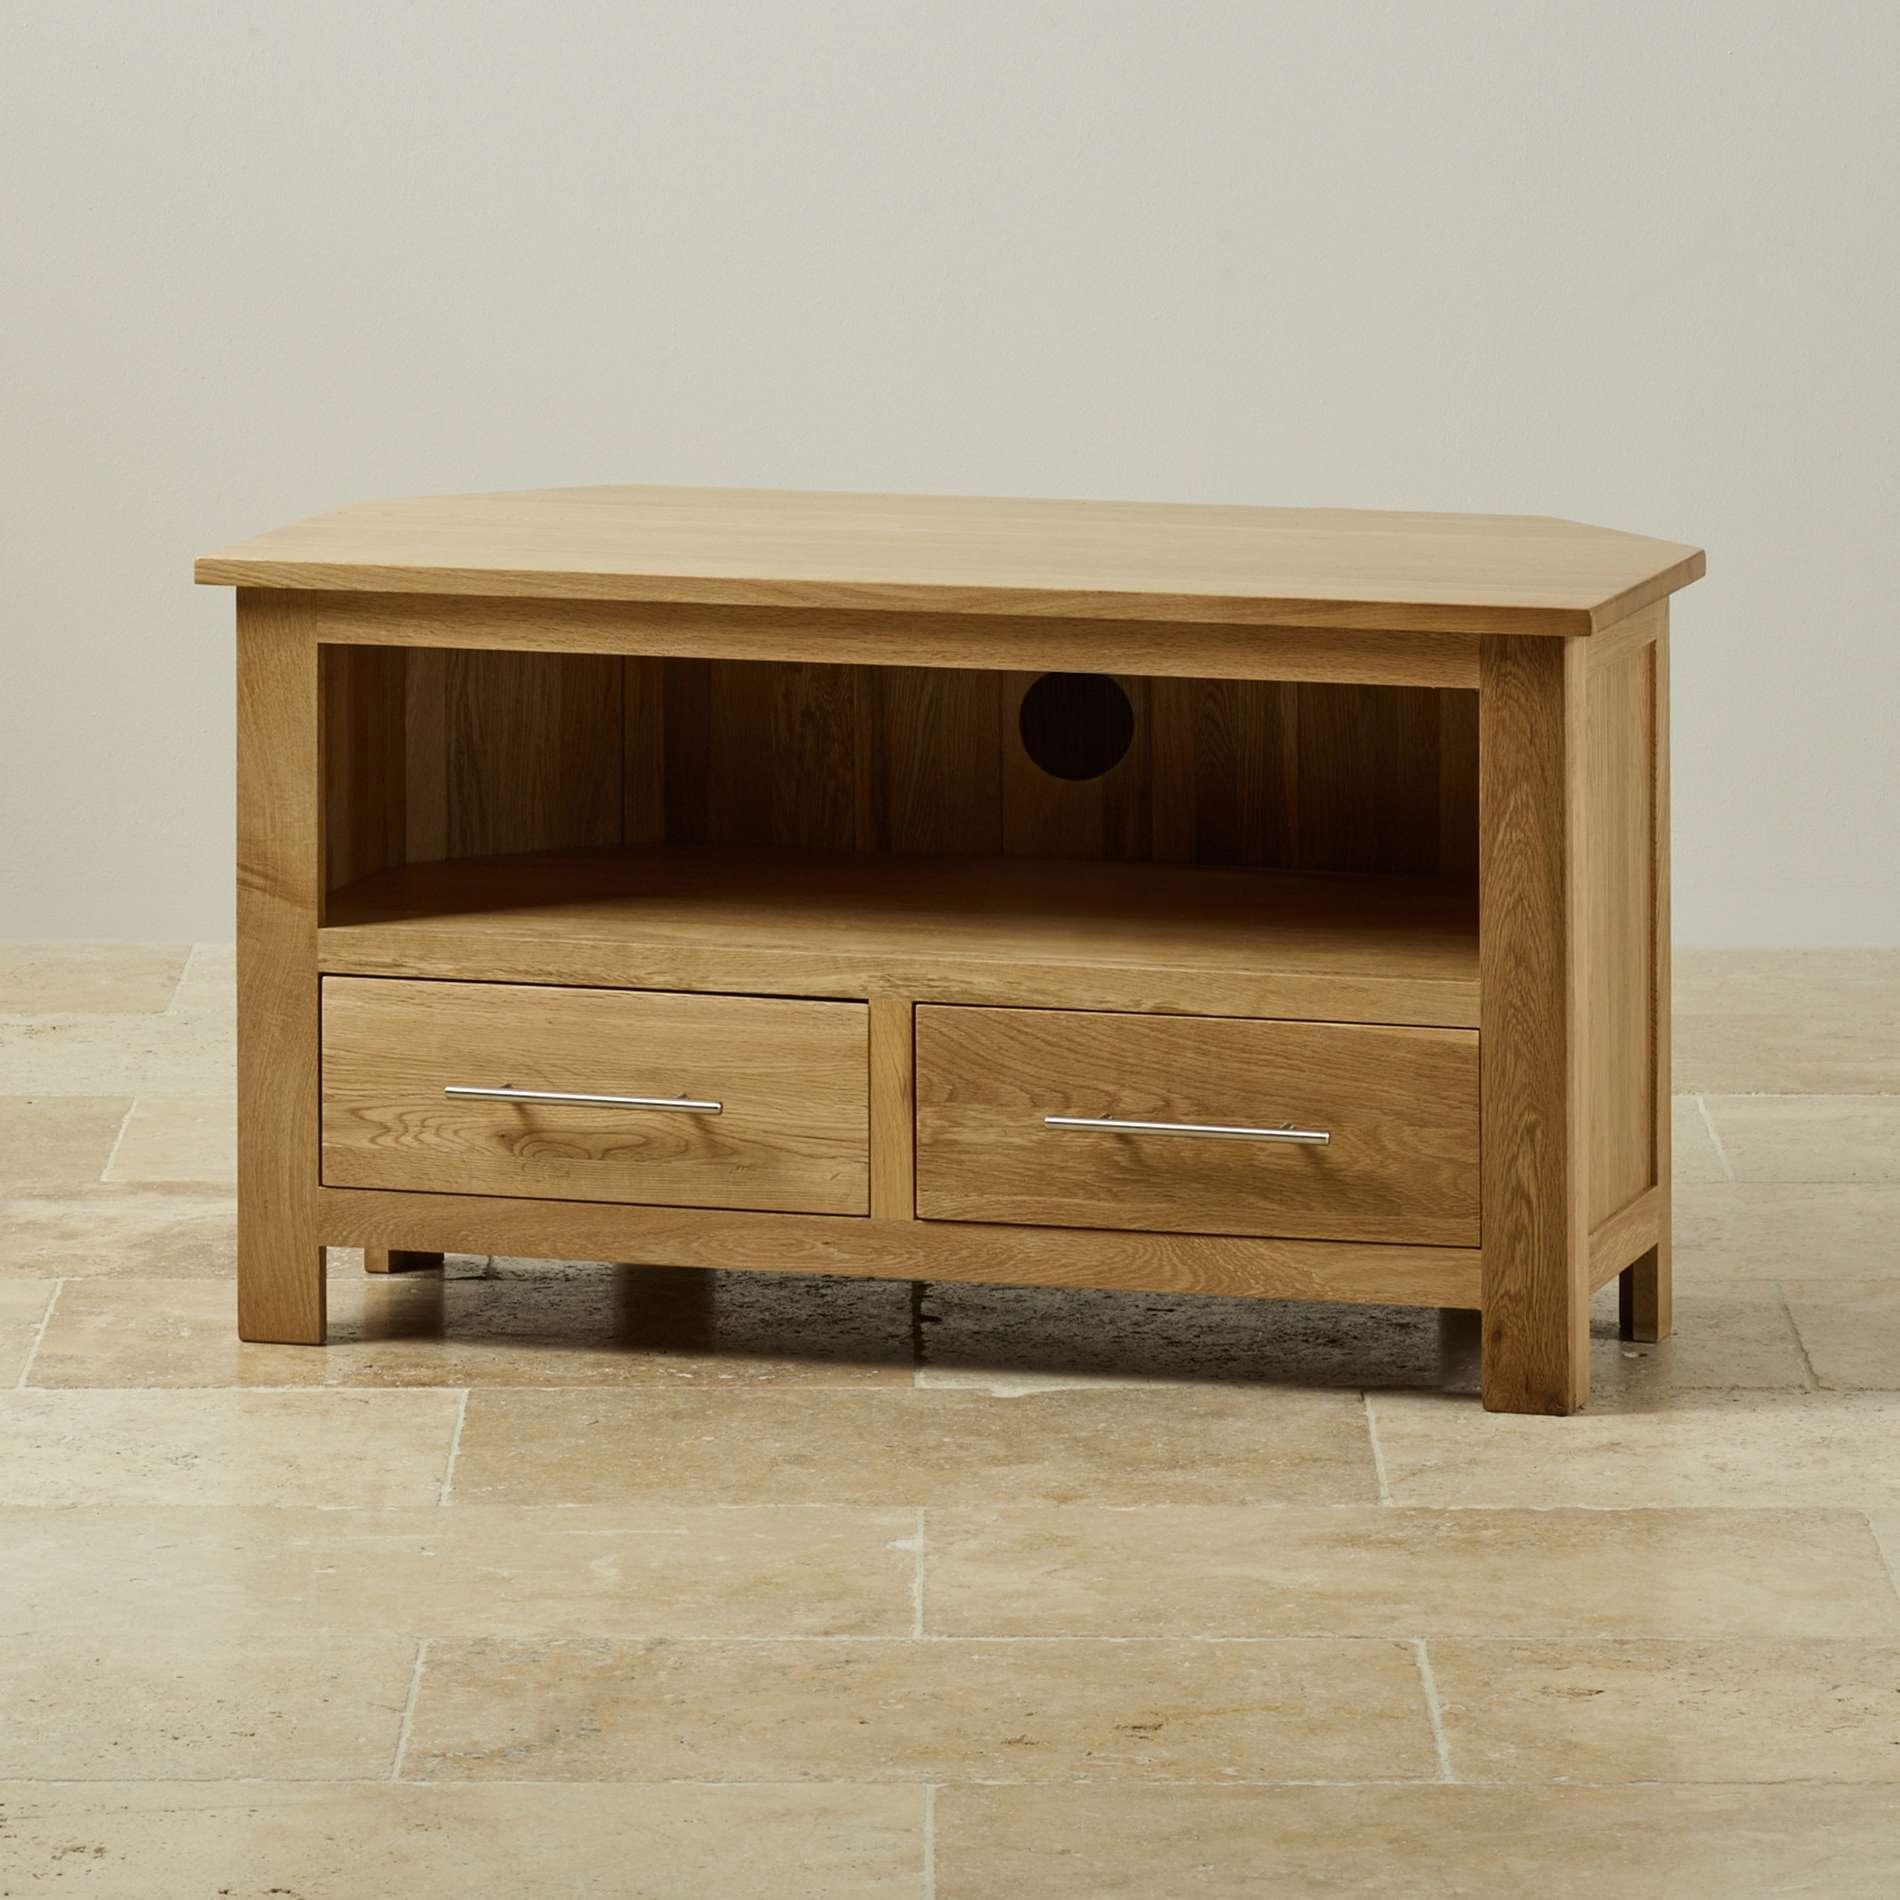 Tv Cabinets   Mango, Painted & Oak Tv Units   Oak Furniture Land In Light Oak Corner Tv Cabinets (View 14 of 20)